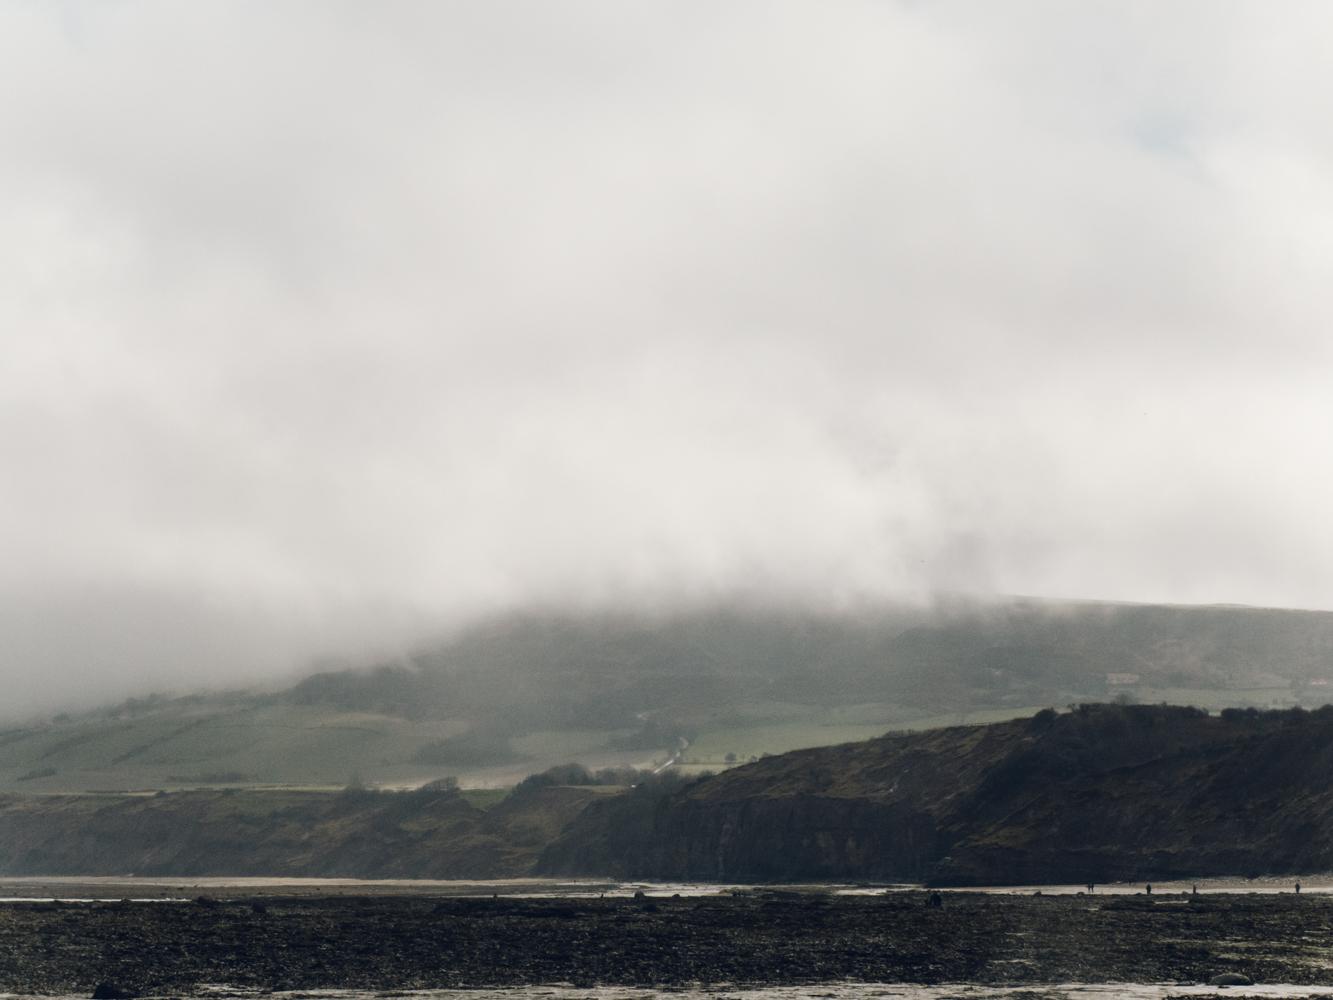 Haarkon Bridlington Yorkshire Robin Hood's Bay Seaside England Sea Beach Village Scarborough cliff rocks cloud